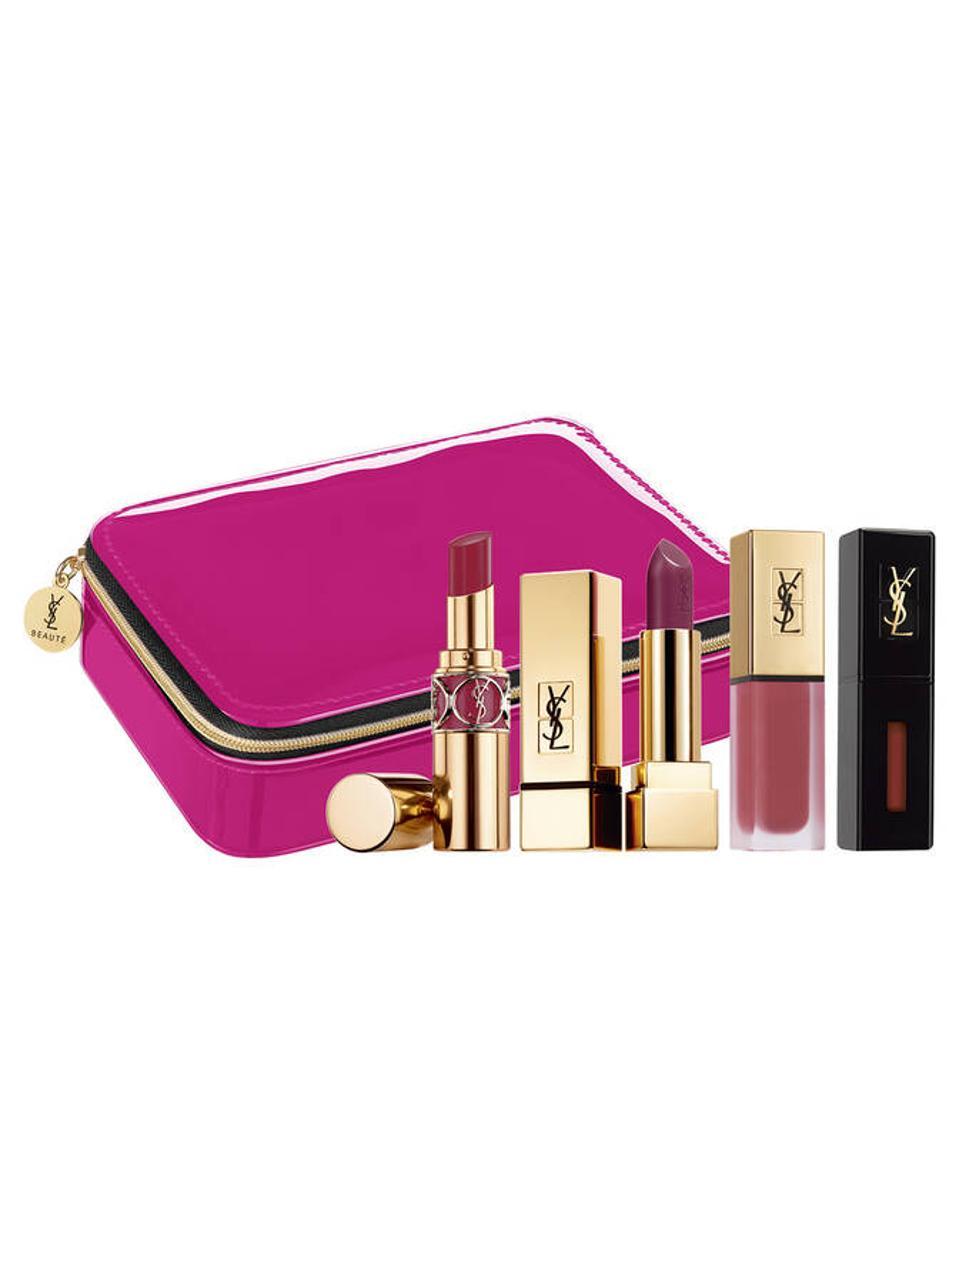 Yves Saint Laurent Beauté My Lips But Better Makeup Set